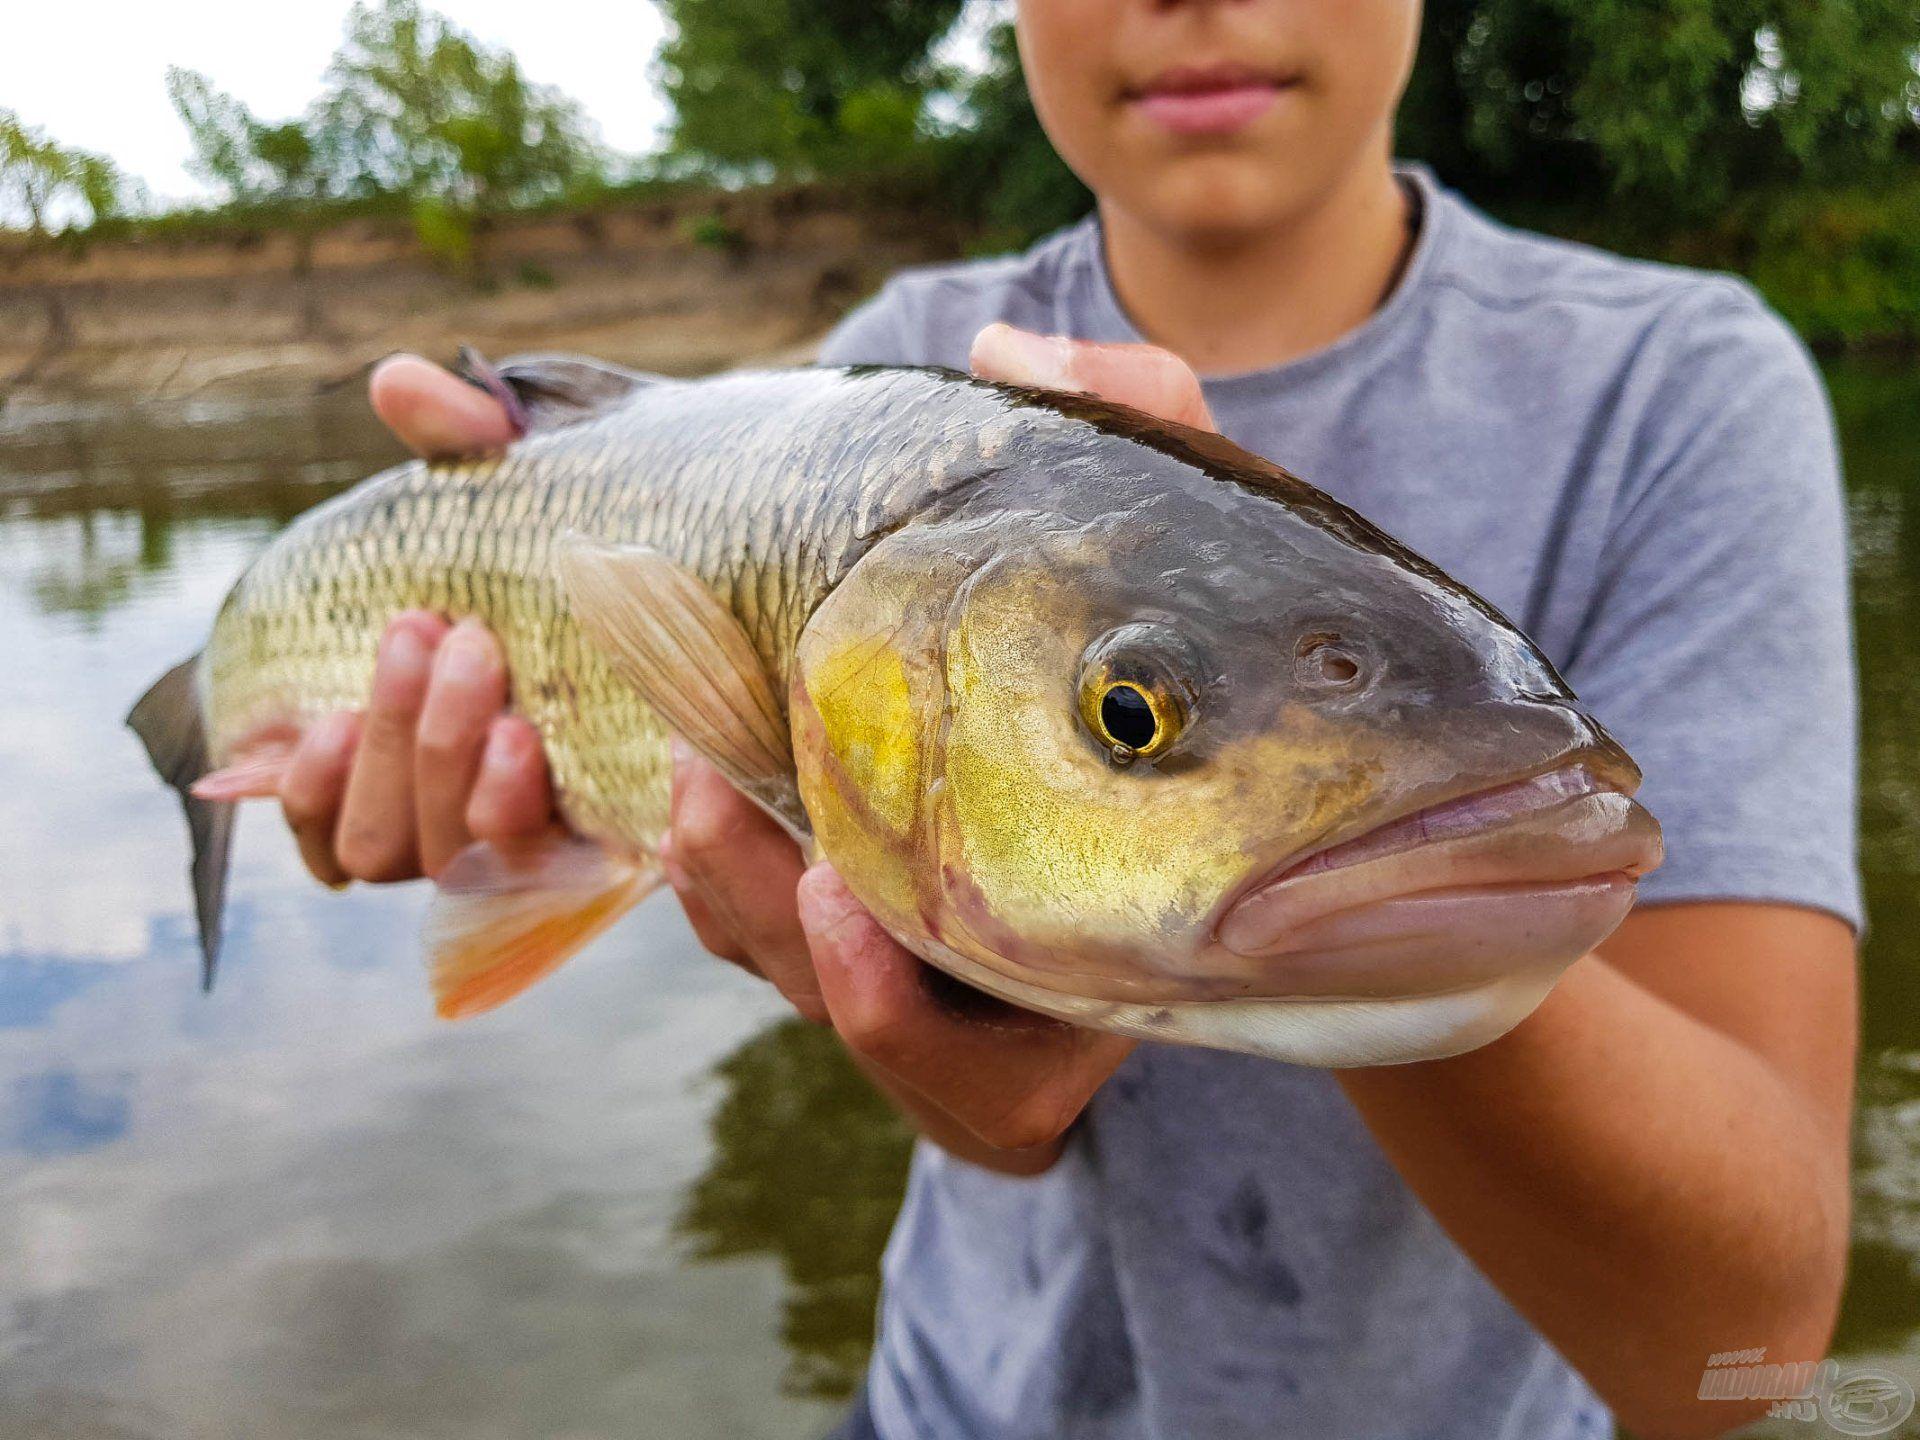 Gyönyörű hal!